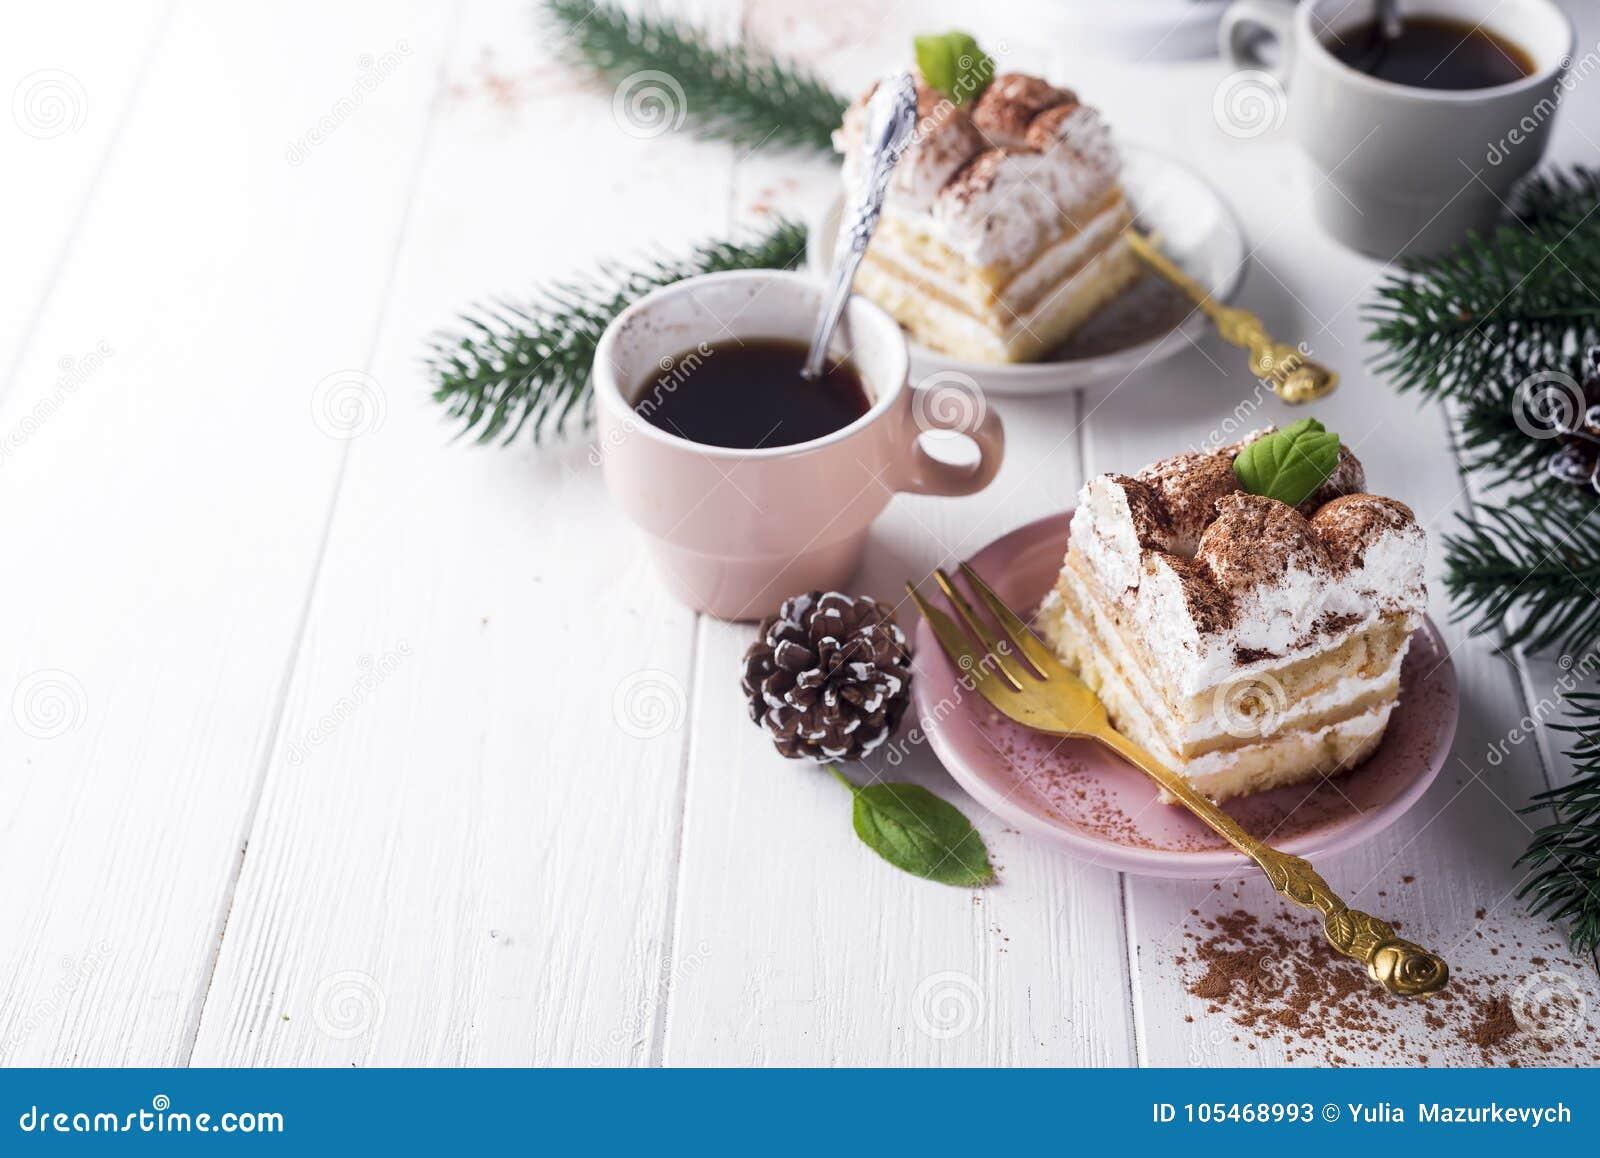 Traditional Italian Dessert Tiramisu Stock Image - Image of biscuit ...